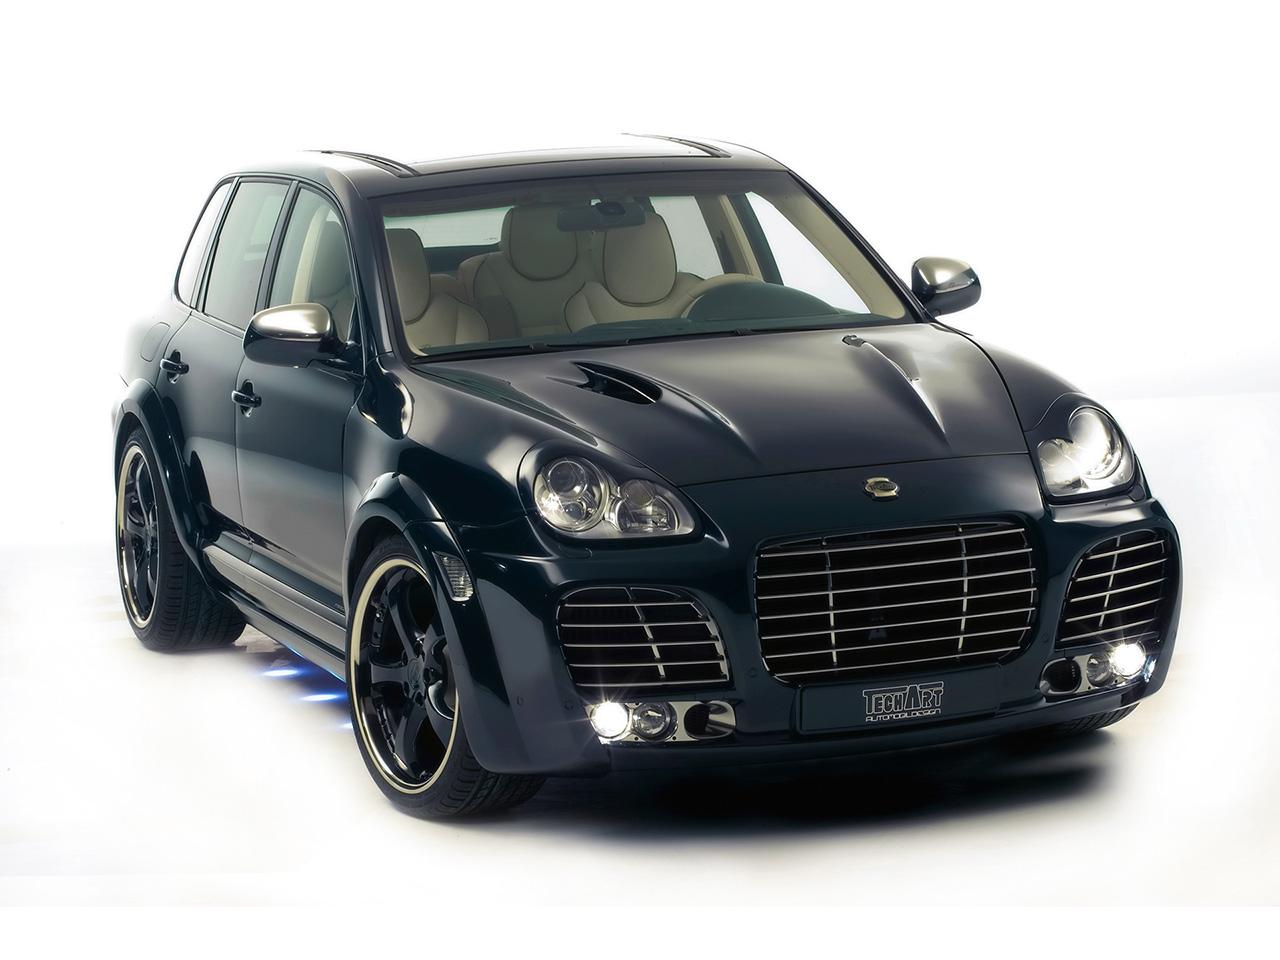 techart magnum based on porsche cayenne turbo car tuning. Black Bedroom Furniture Sets. Home Design Ideas